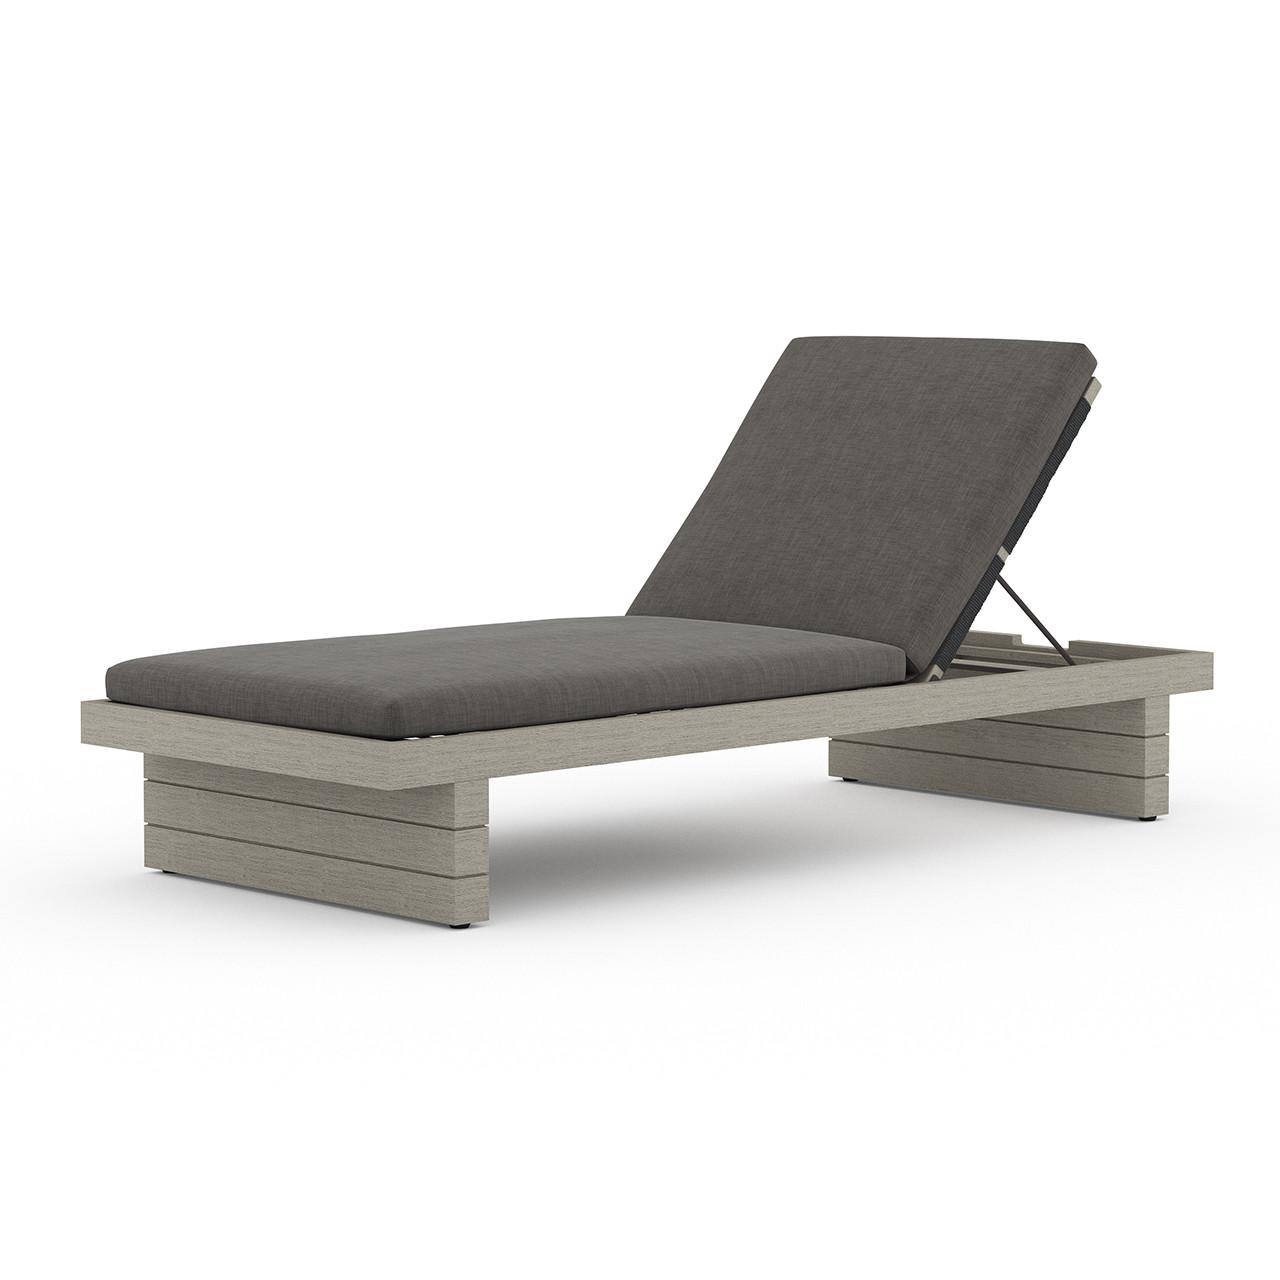 Royce Teak Outdoor Chaise - Weathered Grey